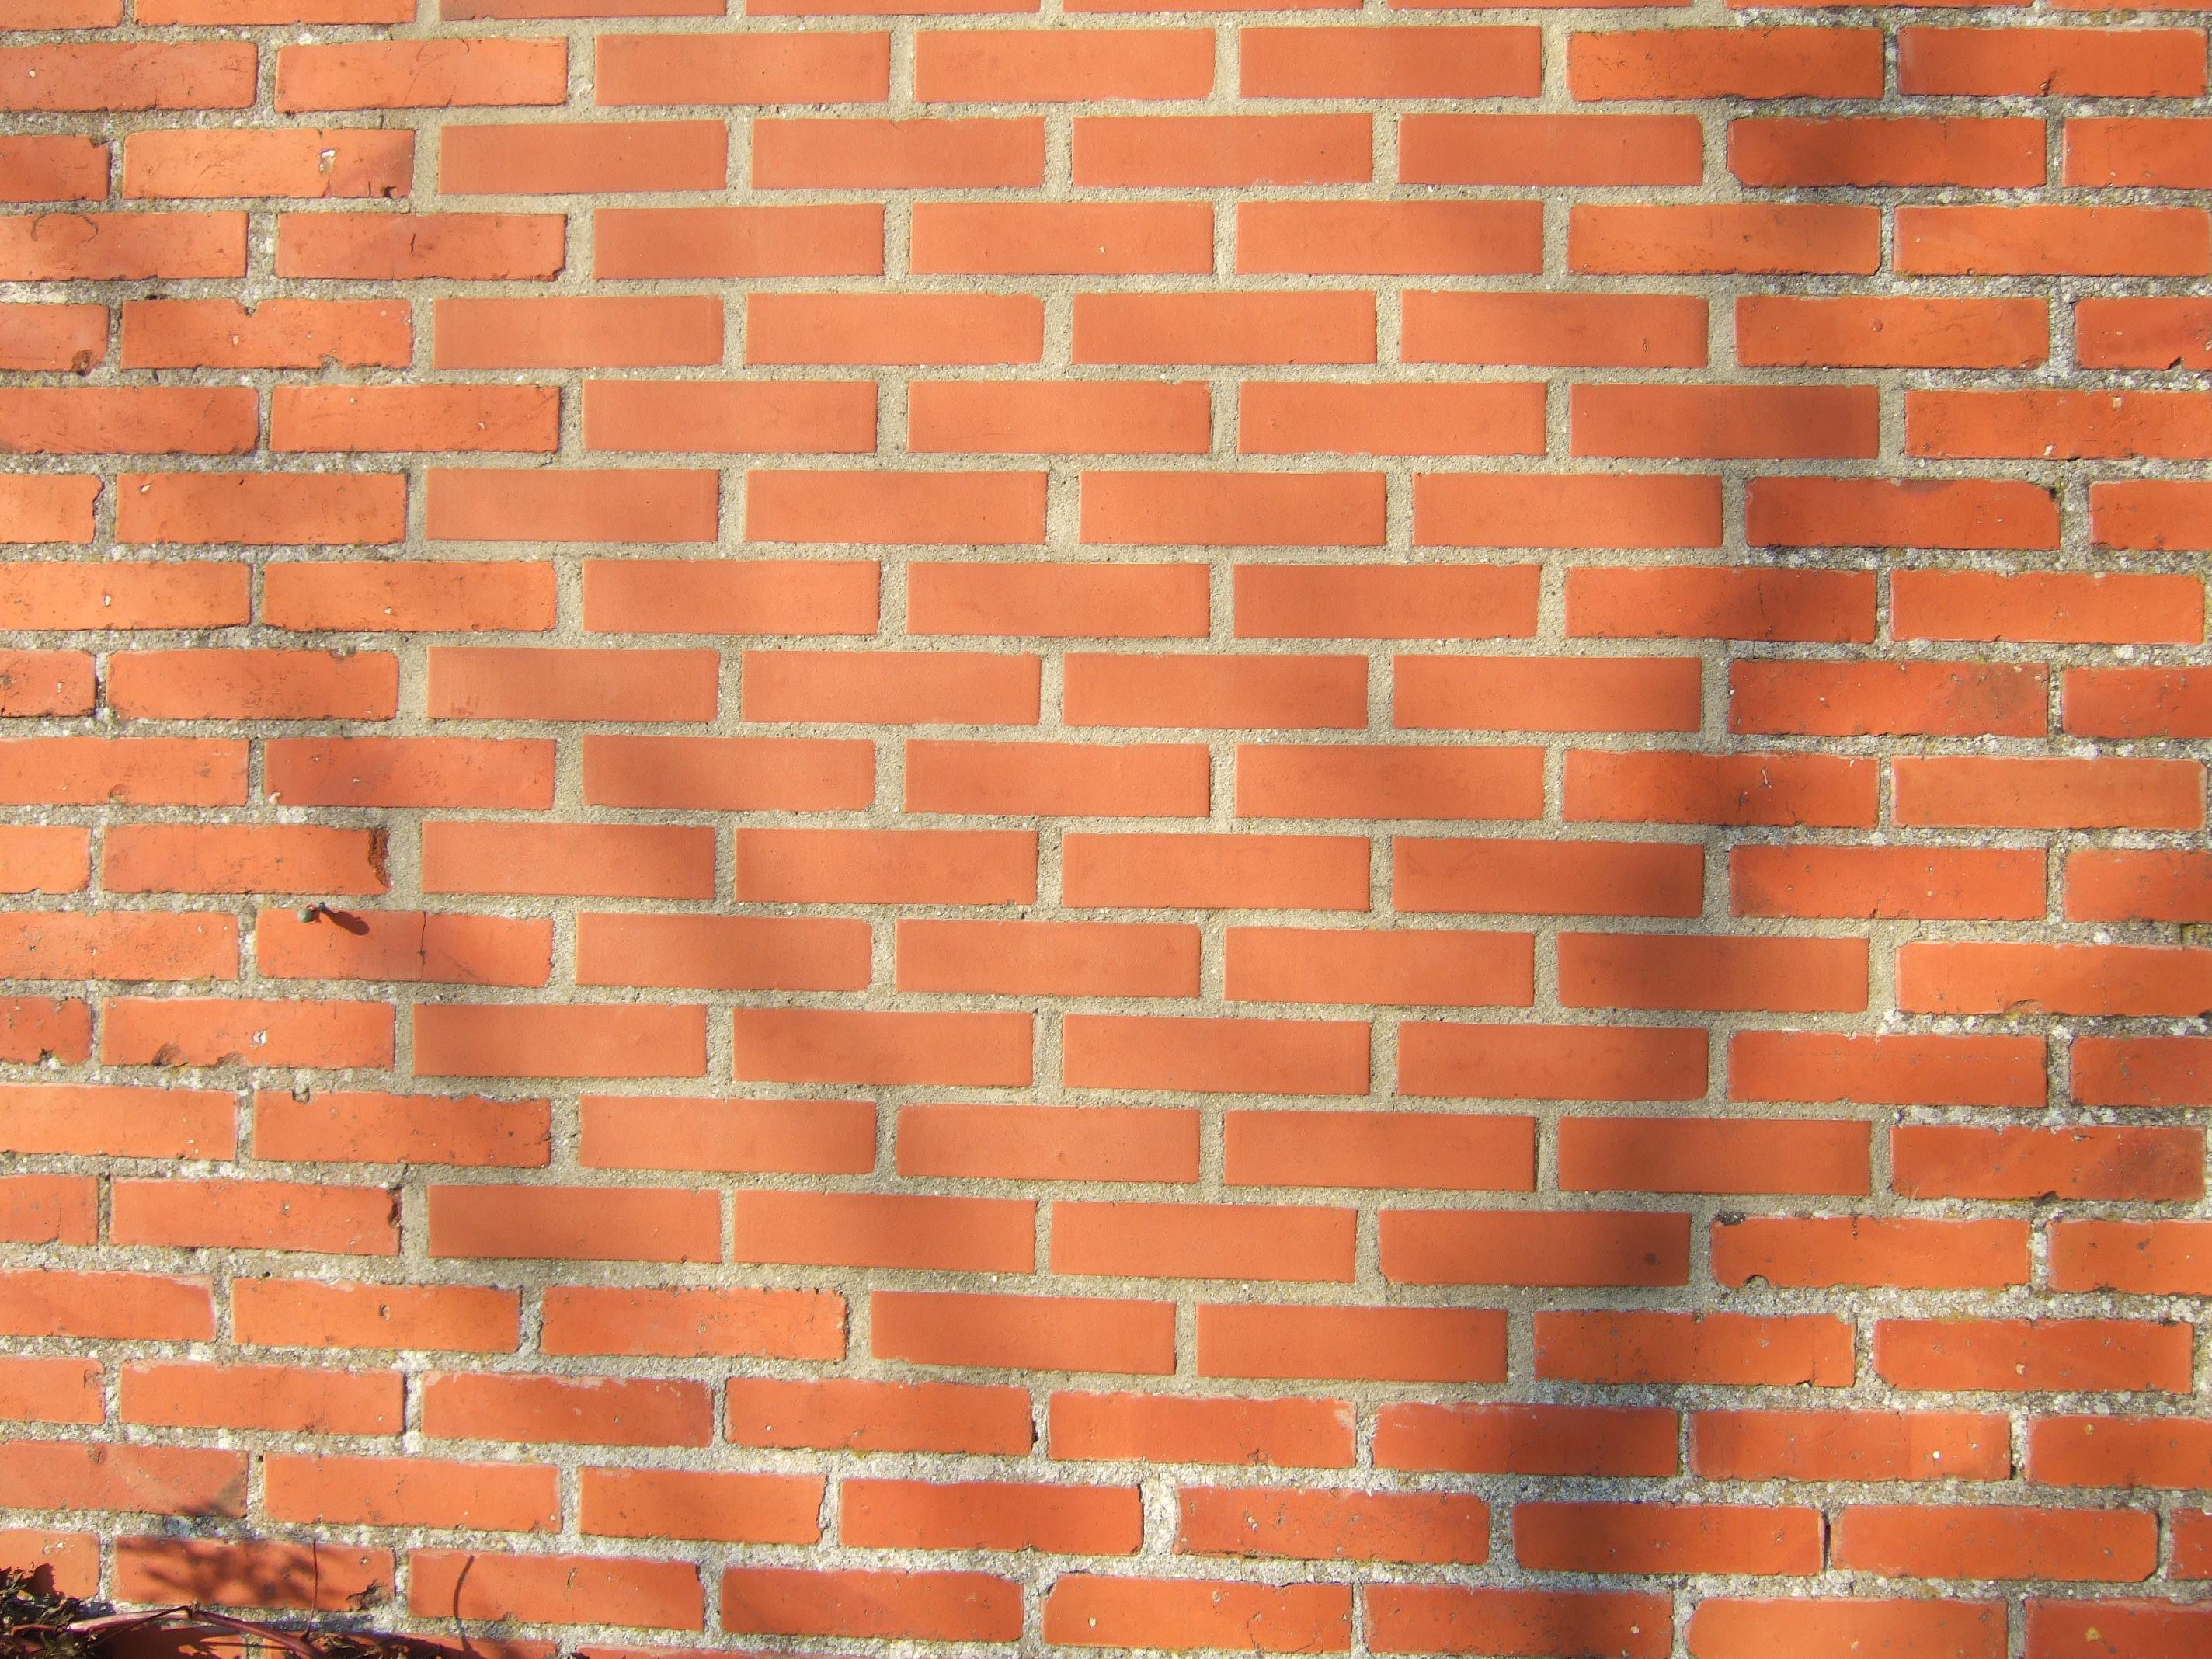 tabus walls new brickwall shadow tree branches texture red